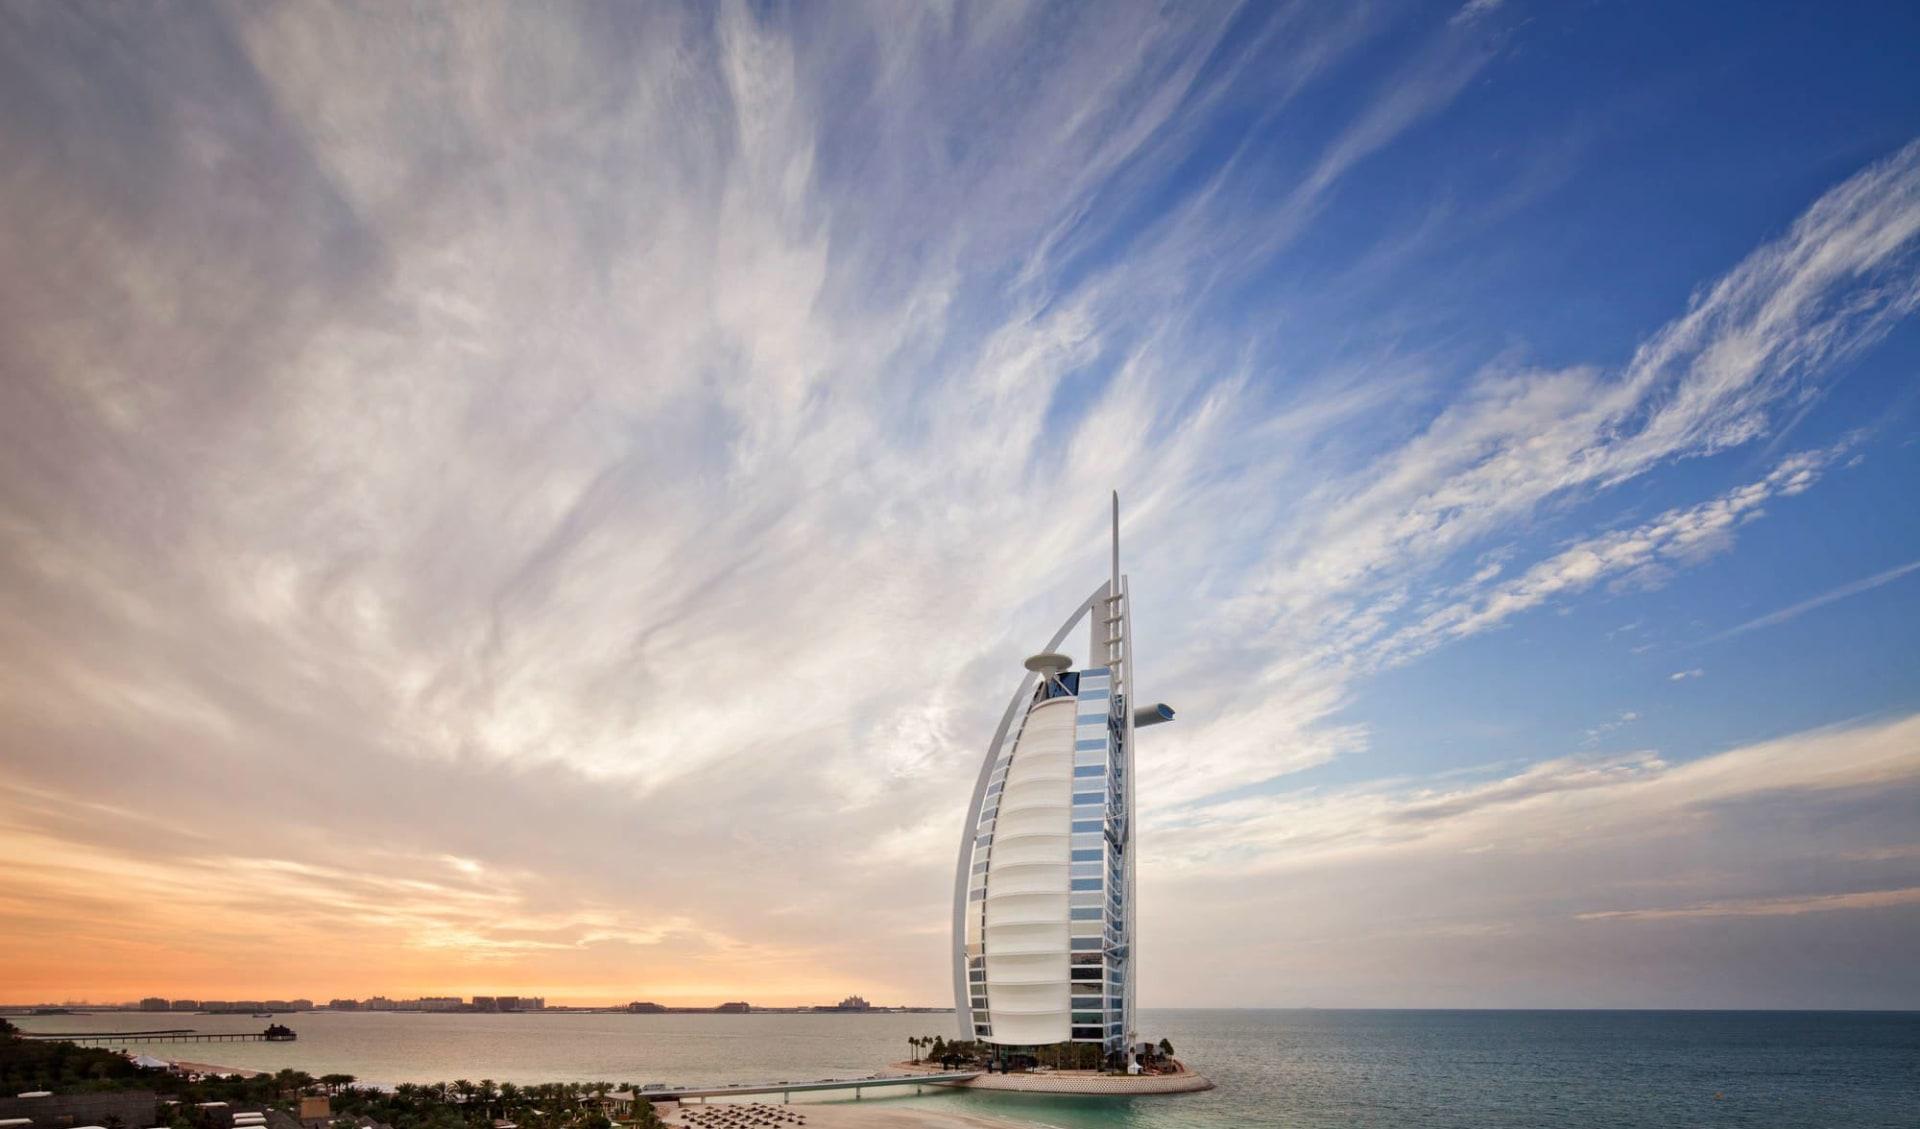 Entdecken Sie die Emirates auf eigene Faust ab Dubai: Burj Al Arab